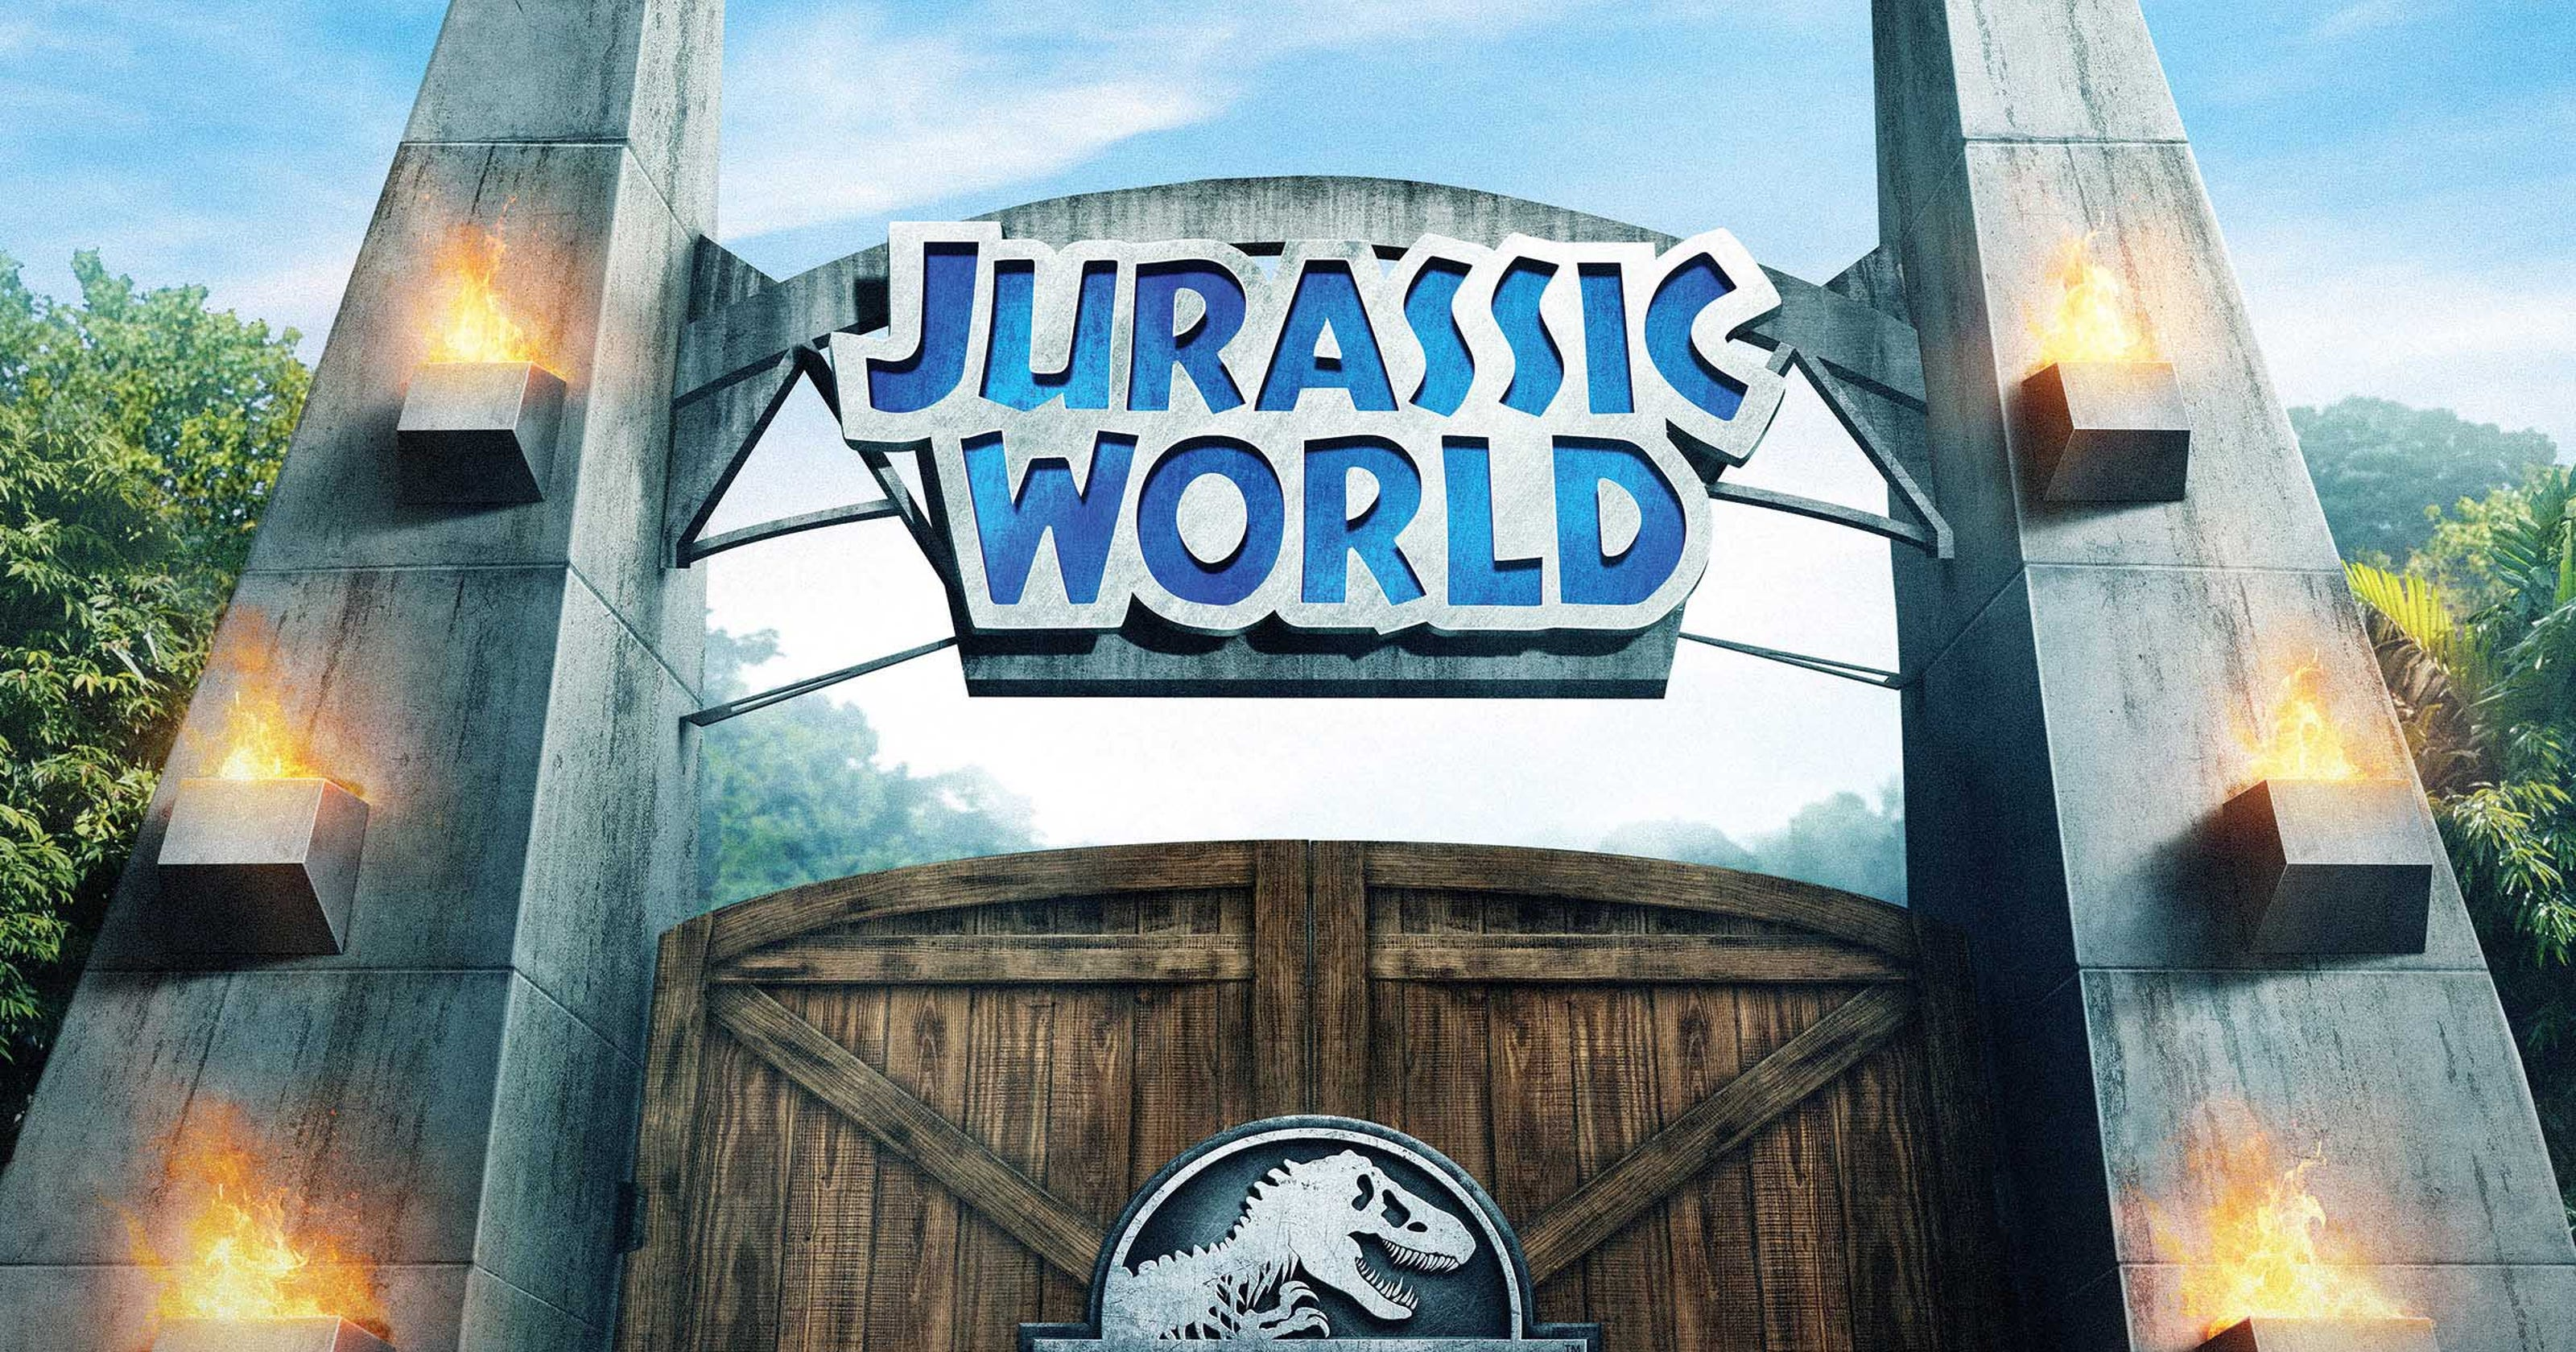 aea50297c44  Jurassic Park  ride going extinct at Universal Studios Hollywood as new   World  beckons